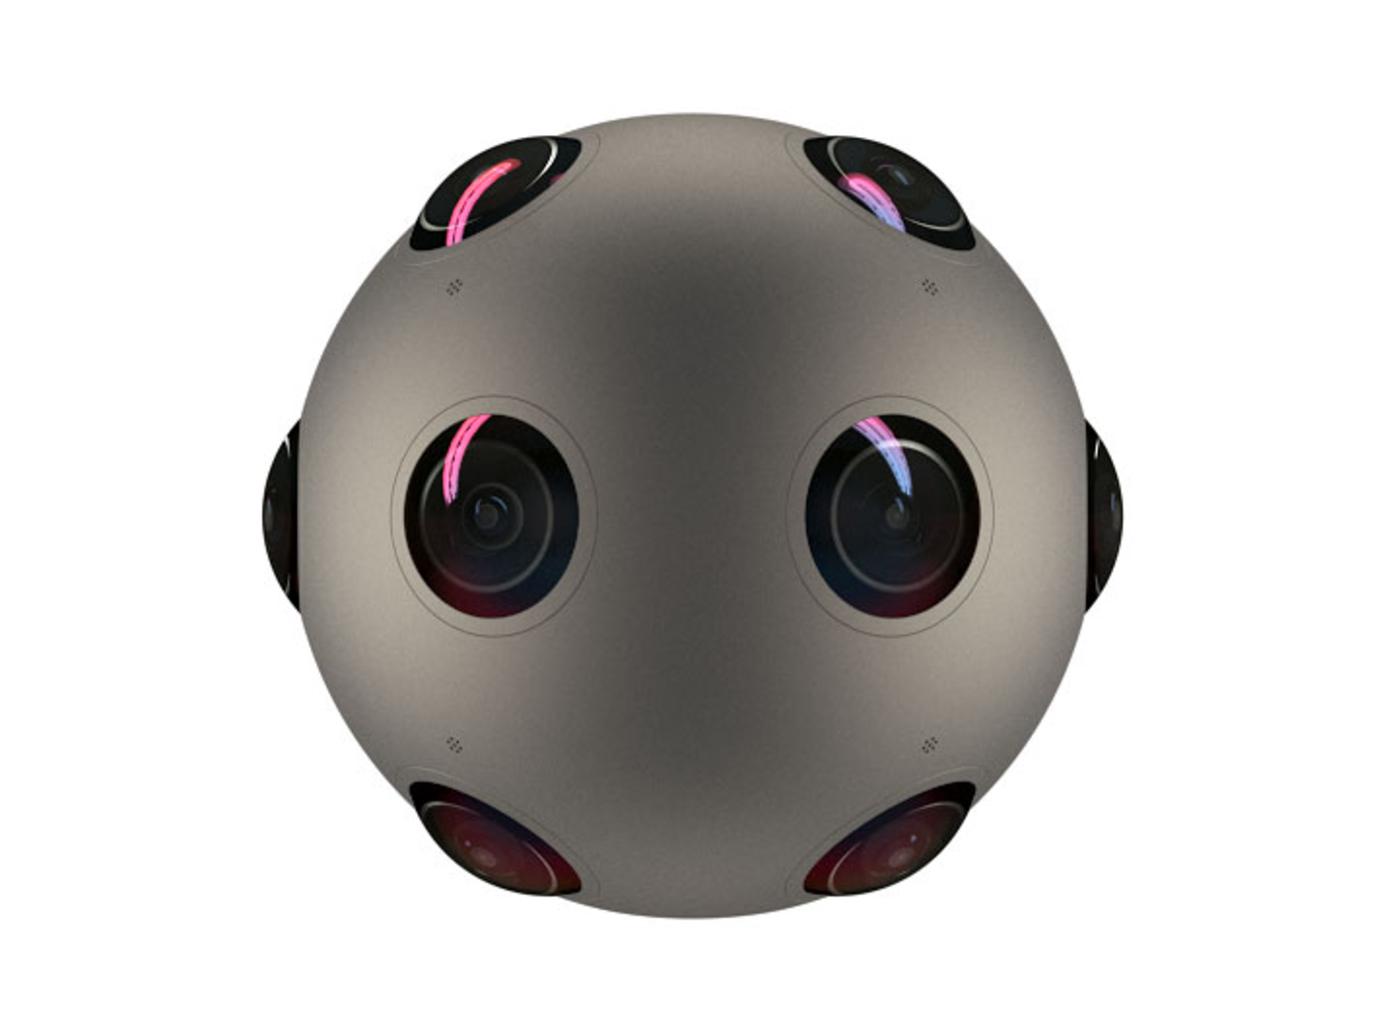 Nokia OZO VR 360 hire | Madrid, Malaga, Sevilla, Bilbao, Barcelona, Mallorca | Camaleón Rental